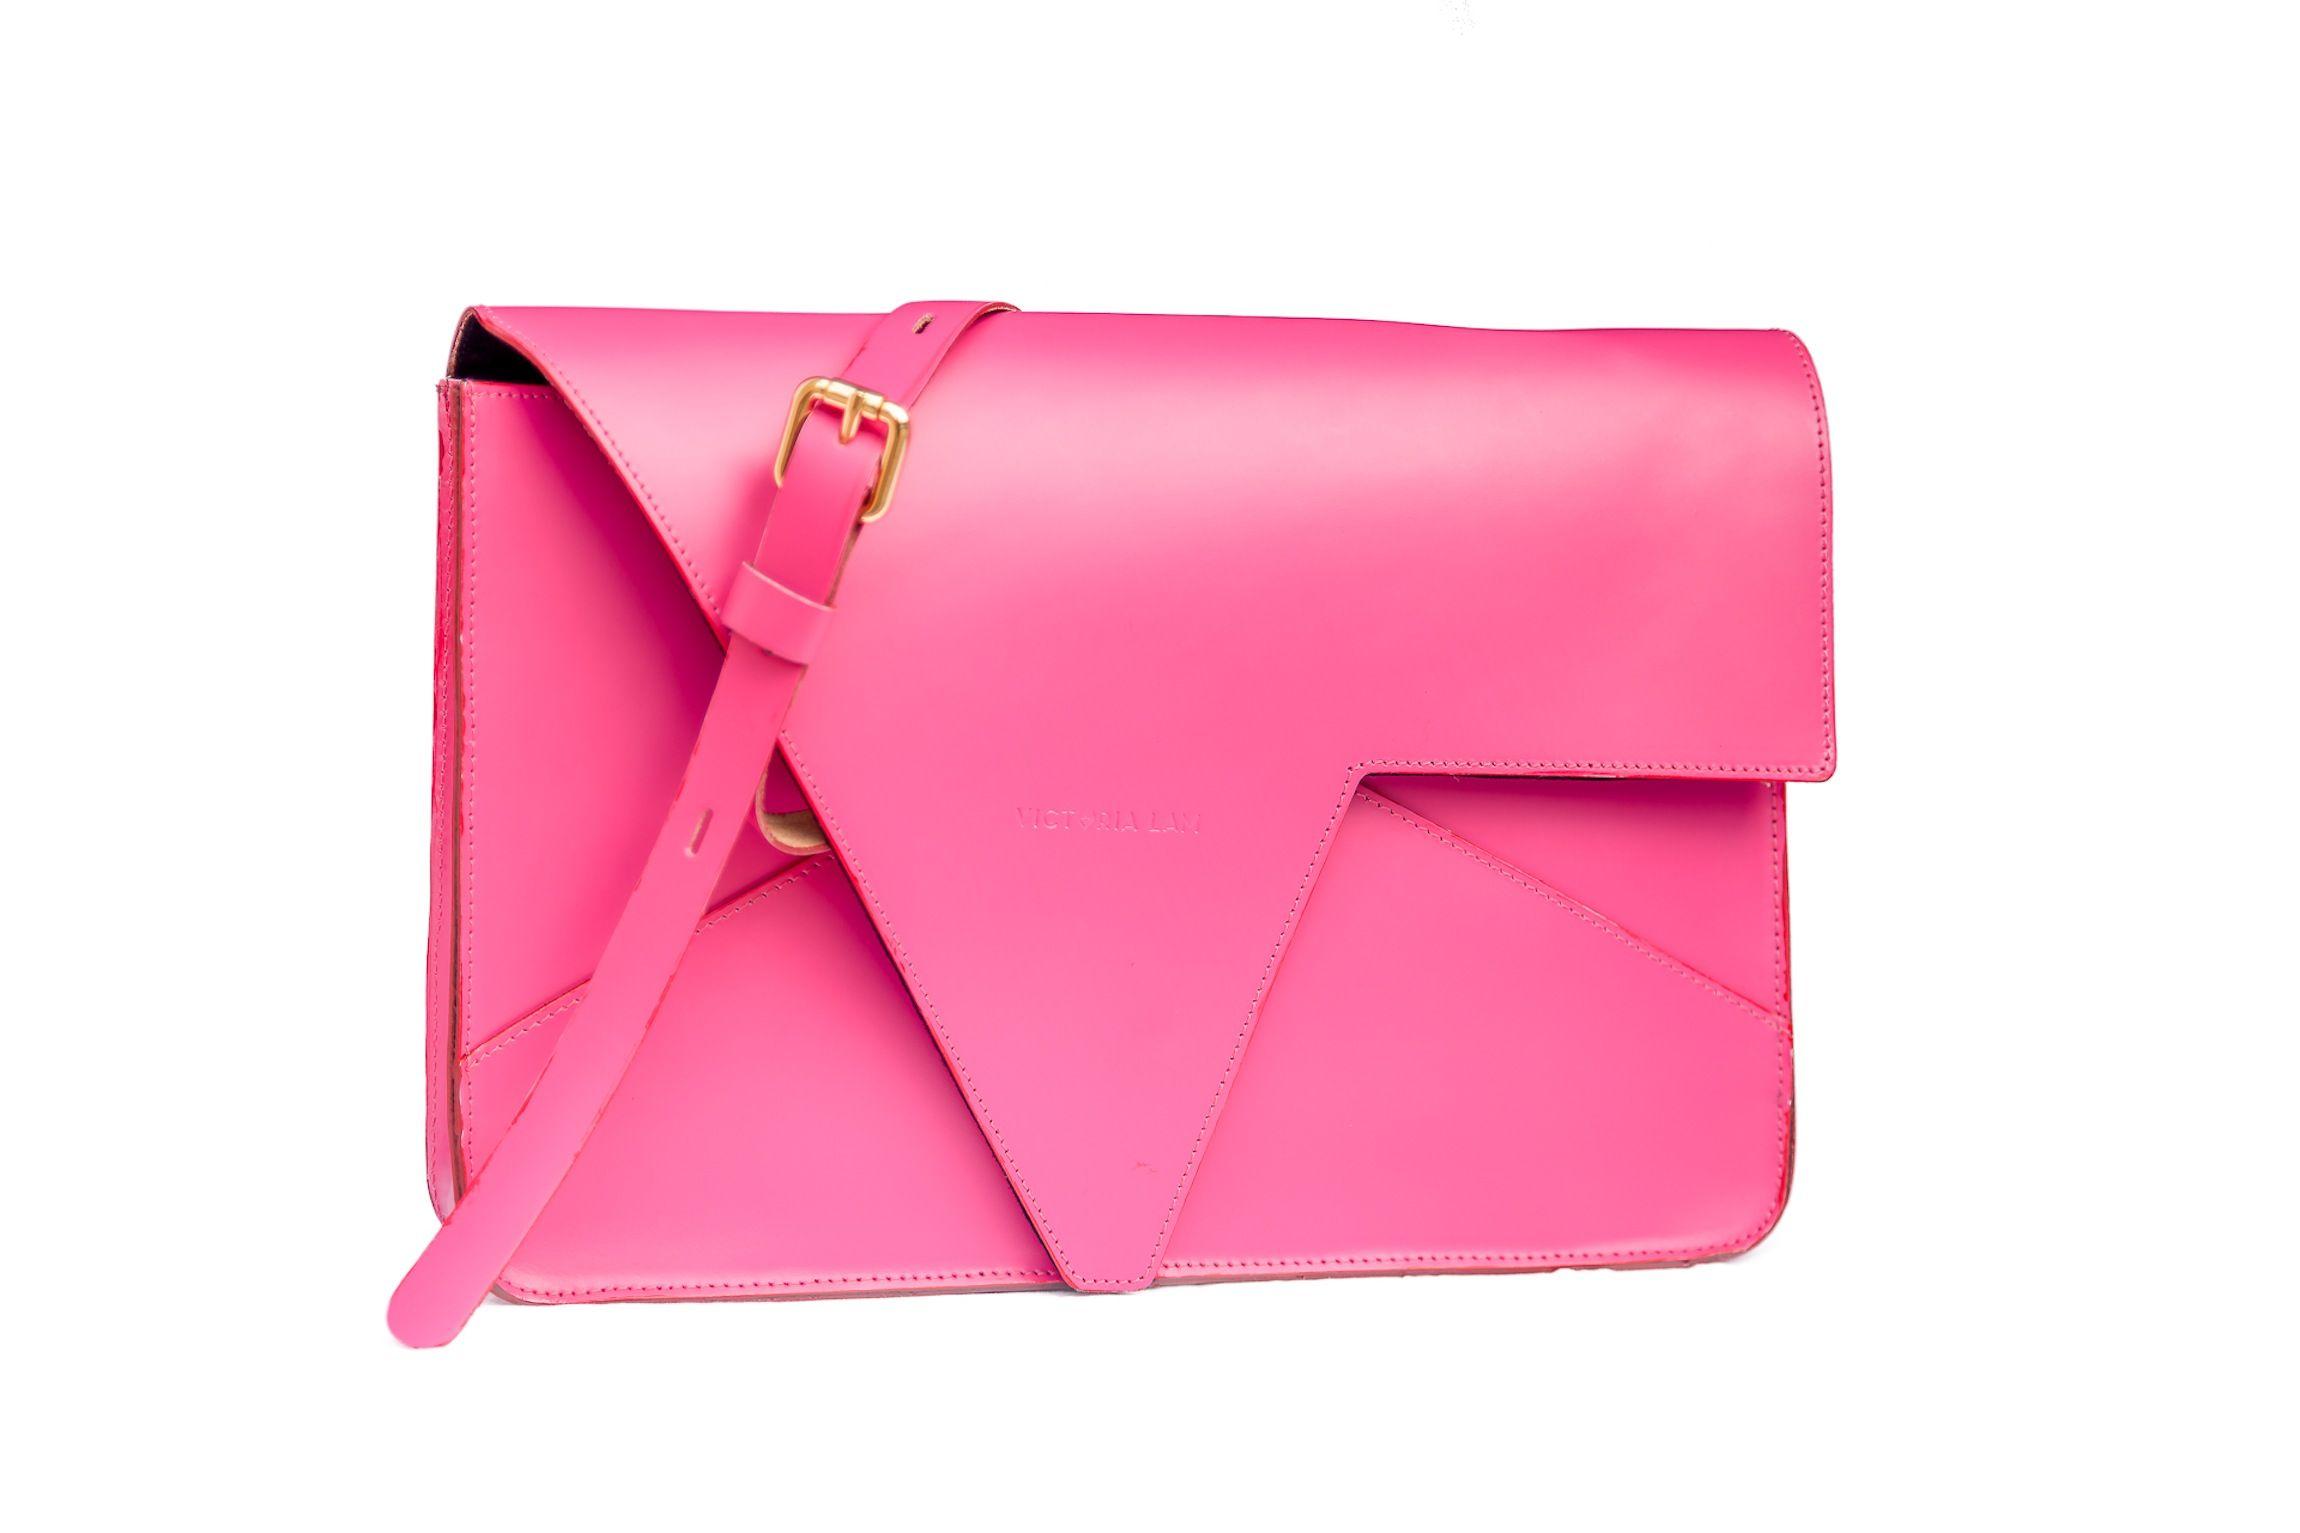 Lovinni Leather Bag Fuchsia Pink